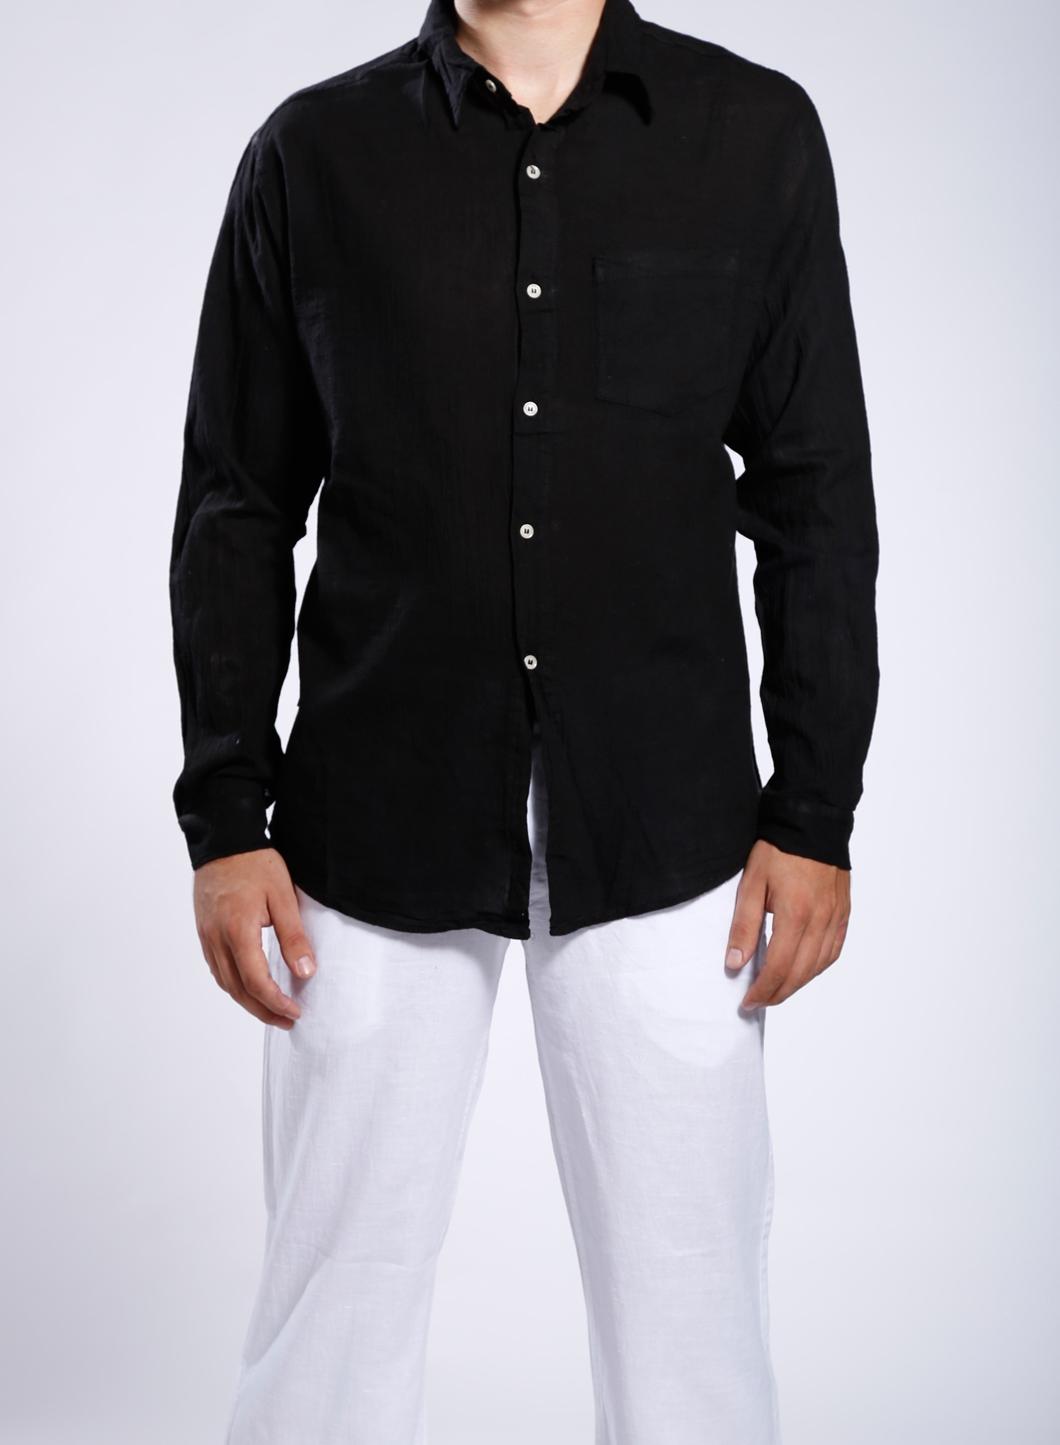 Coral T Shirt Men